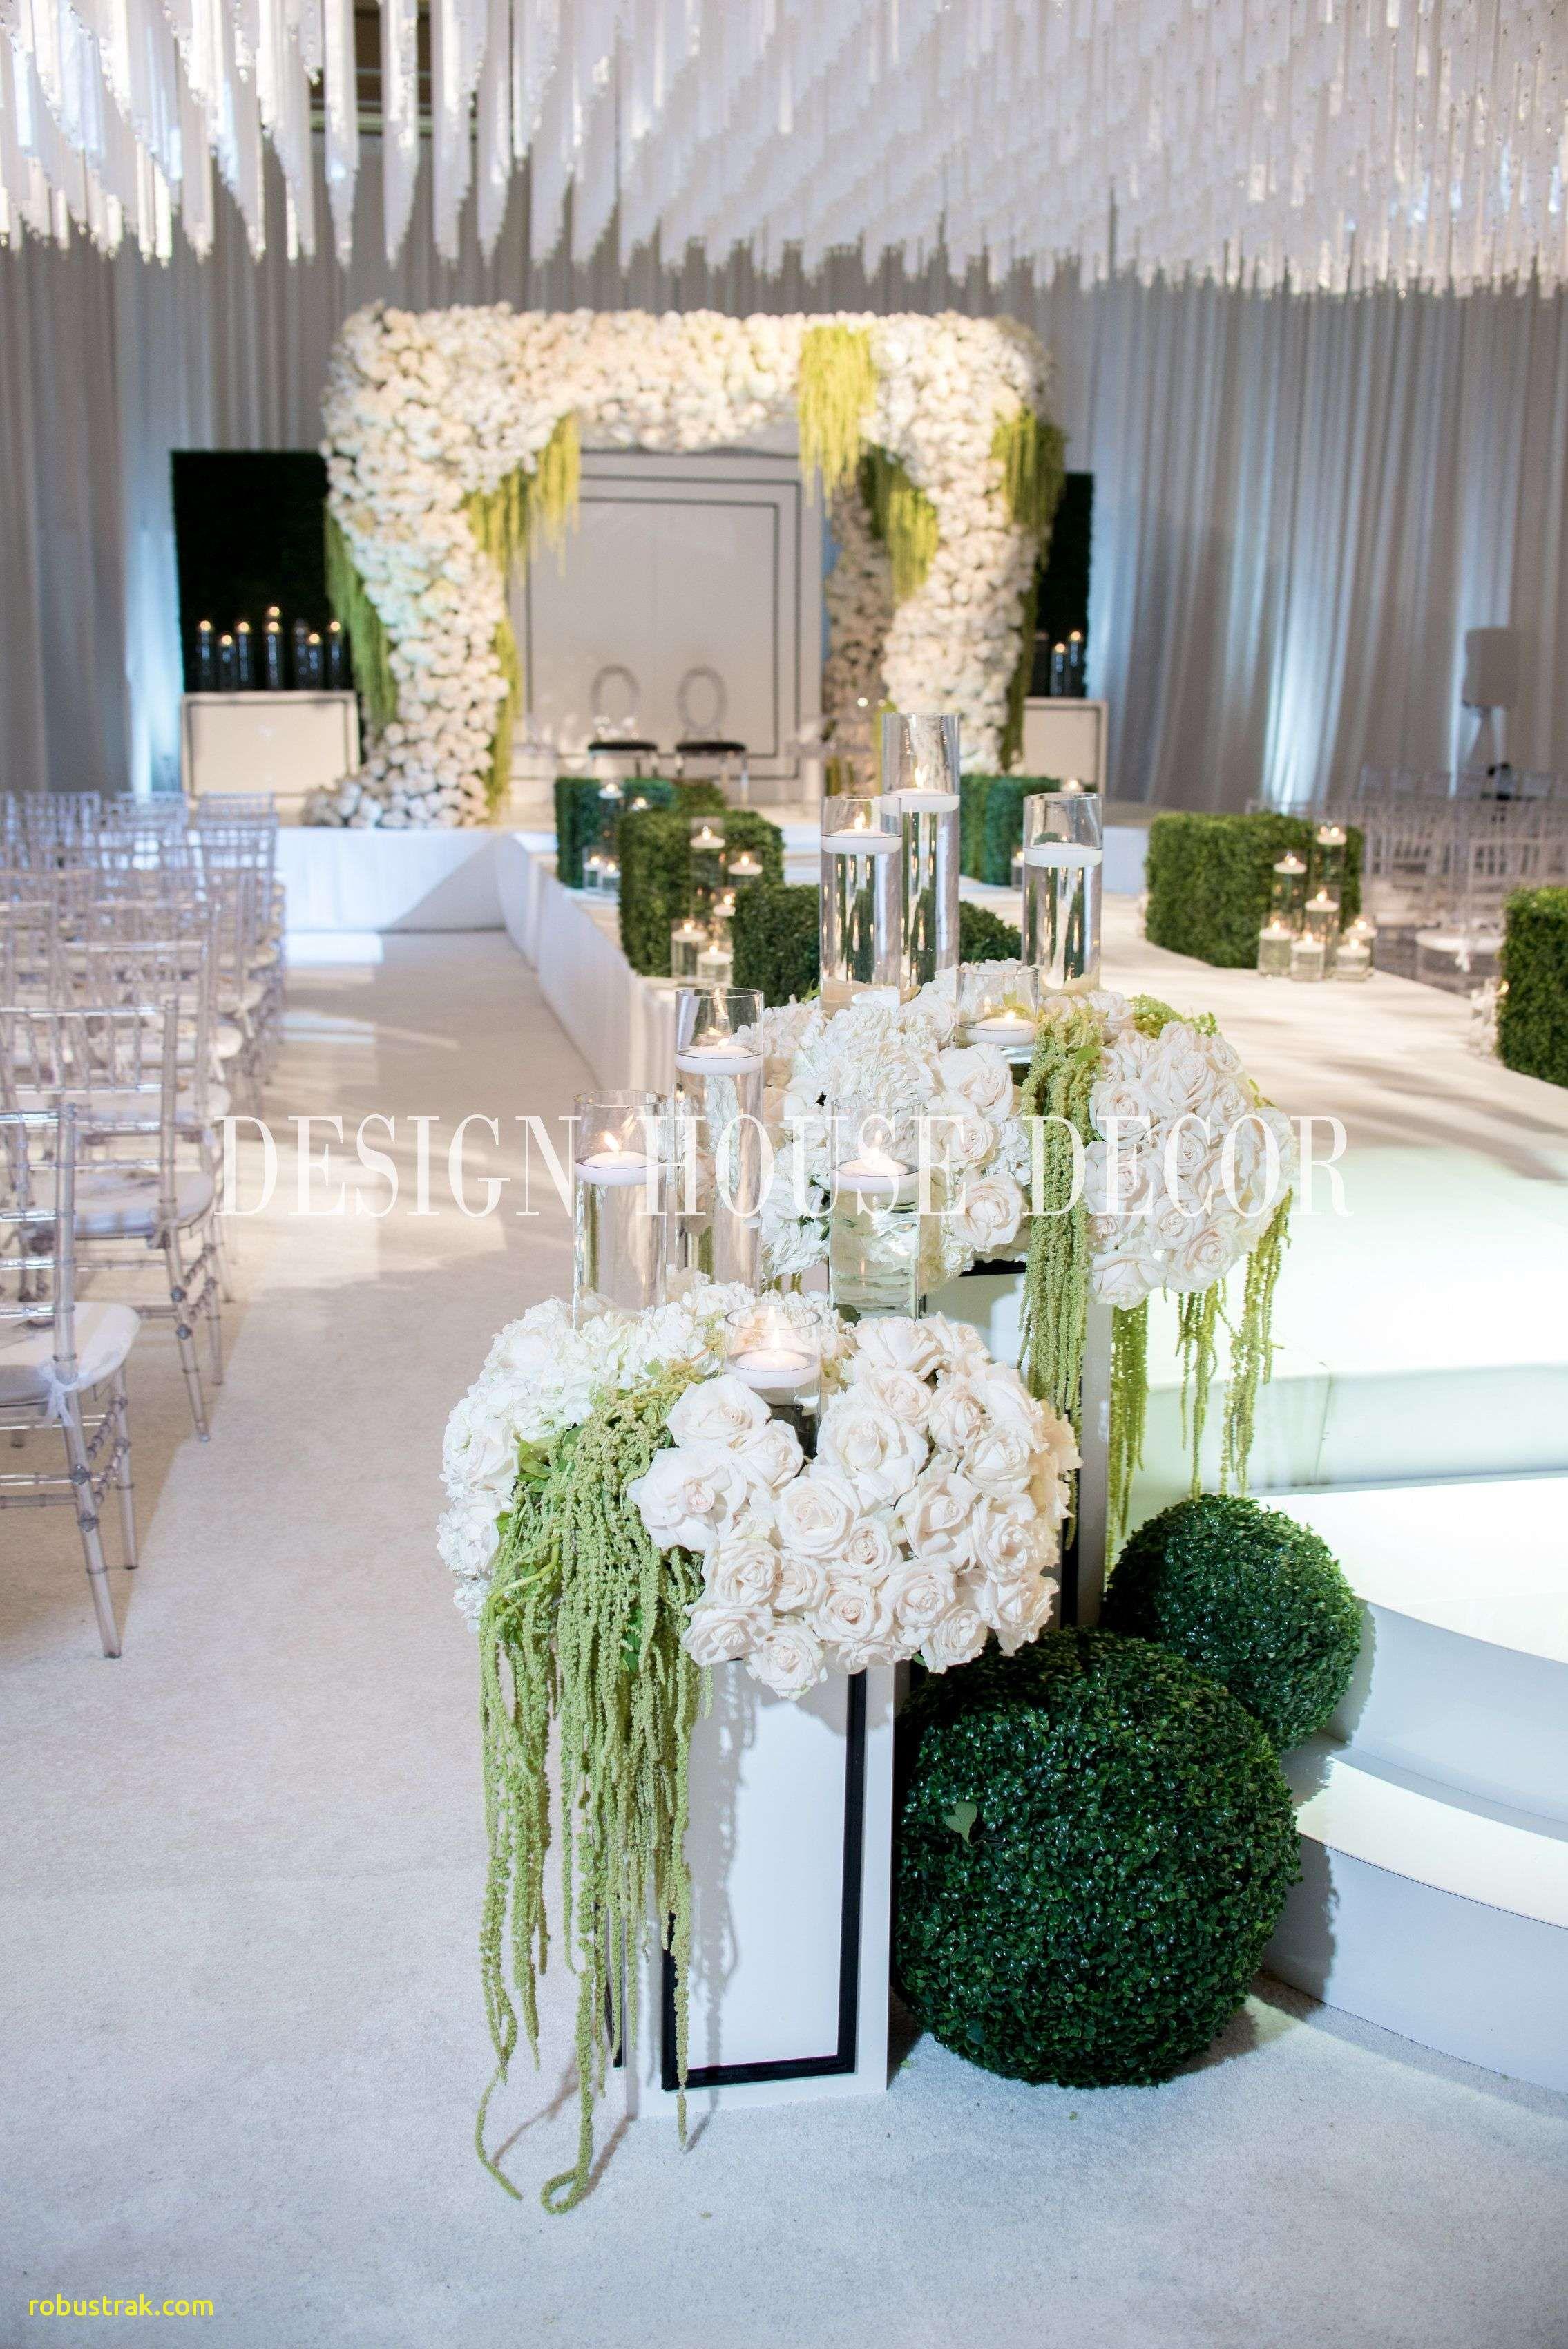 Awesome Indoor Wedding Ceremony Decoration Ideas Https Robustrak Com I Extravagant Wedding Decor Home Wedding Decorations Wedding Aisle Decorations Rustic